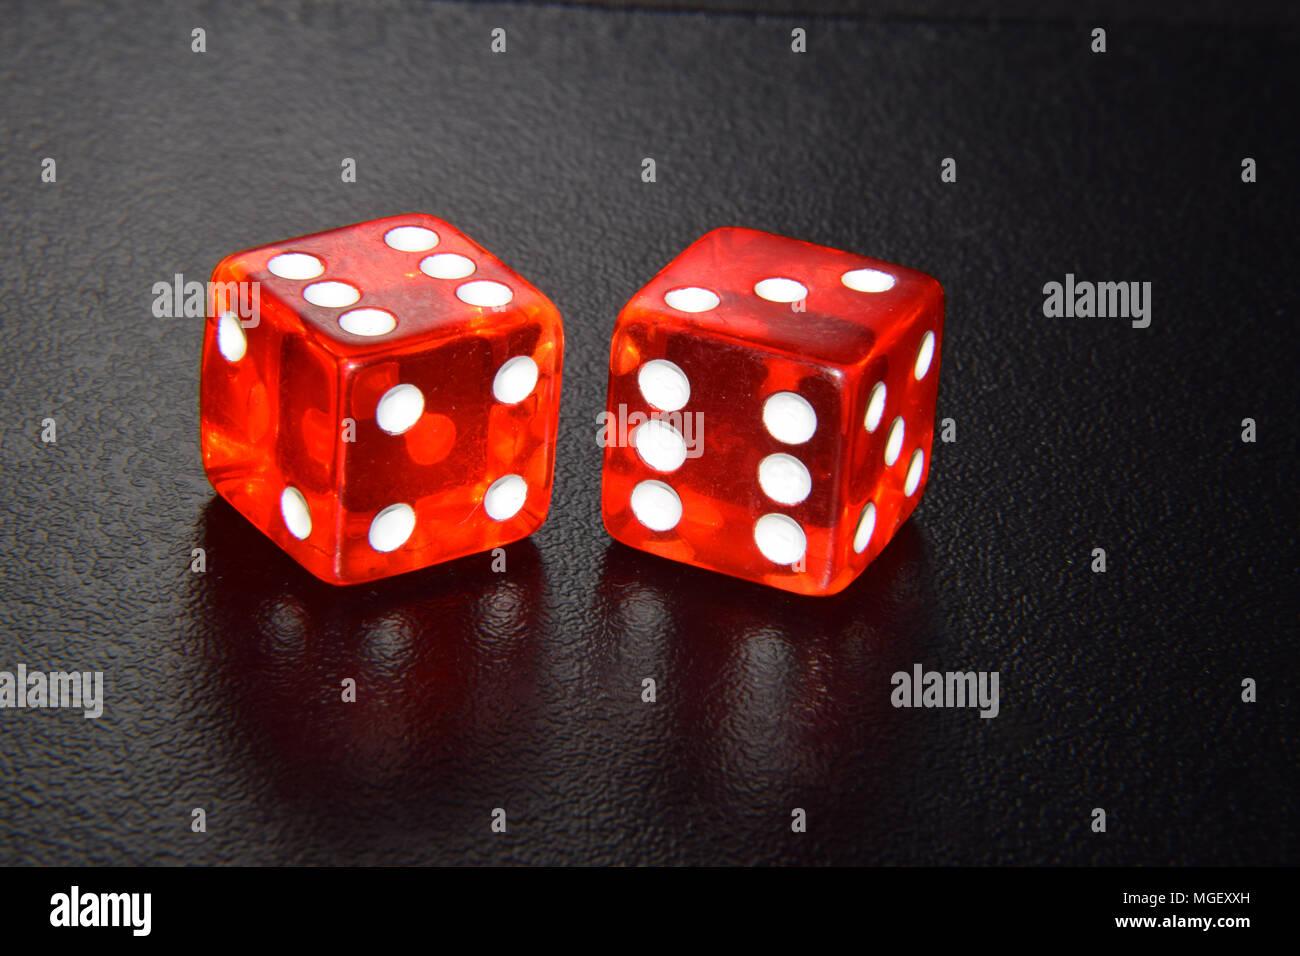 Red luminescent casino gambling dice on black background Stock Photo